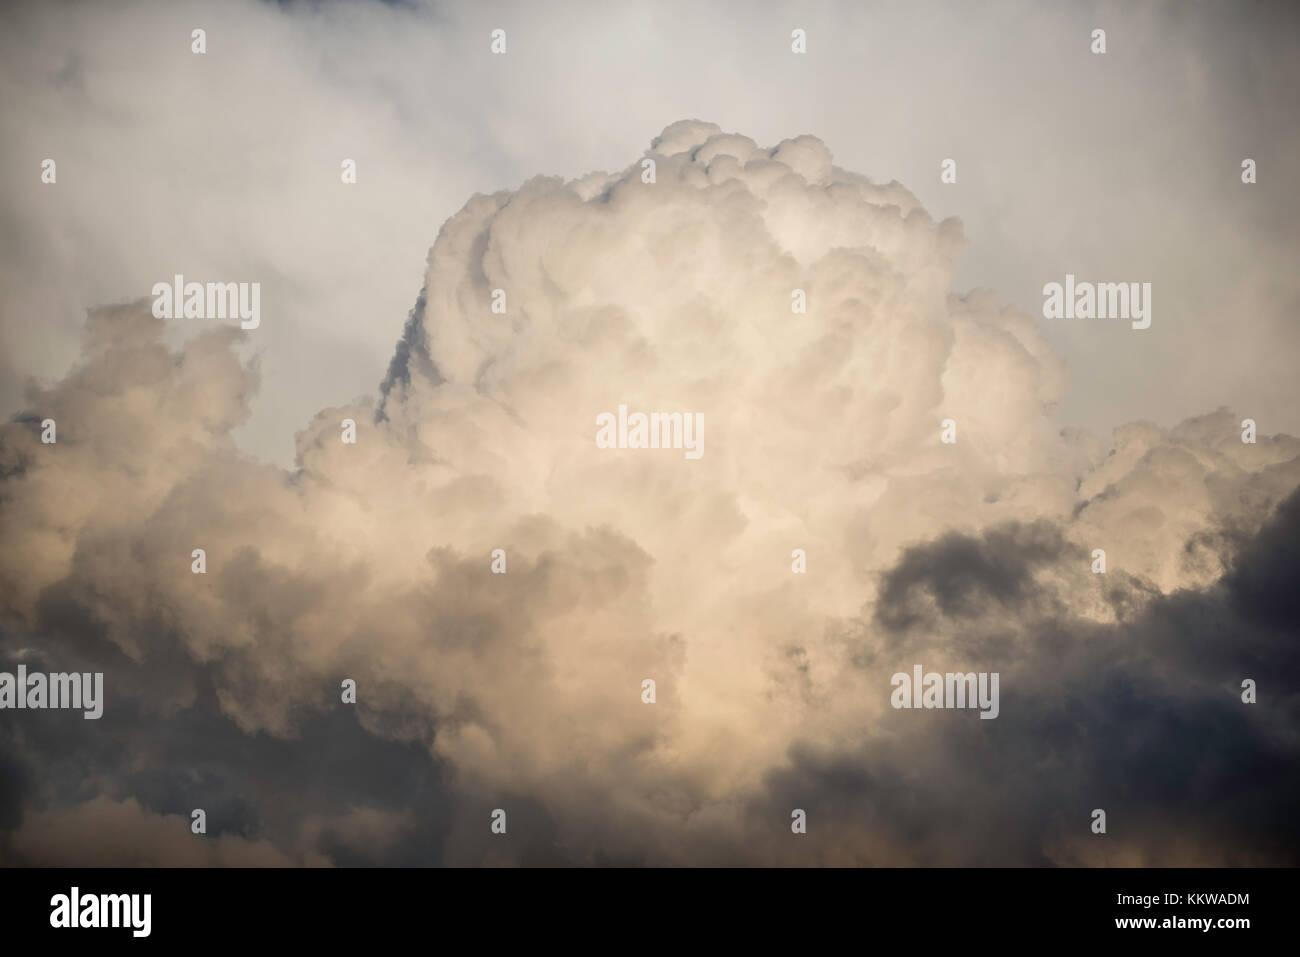 Cumulus congestus clouds, high elevation, Mount Evans Wilderness area, Colorado, USA by Bruce Montagne/Dembinsky - Stock Image